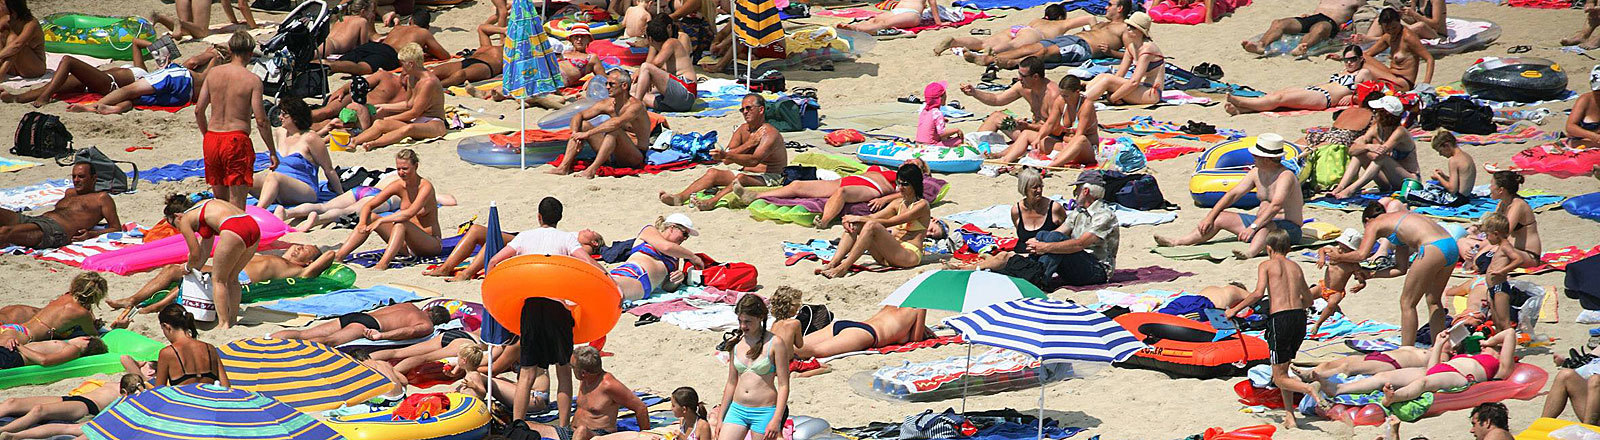 Touristen am Strand von Palma de Mallorca